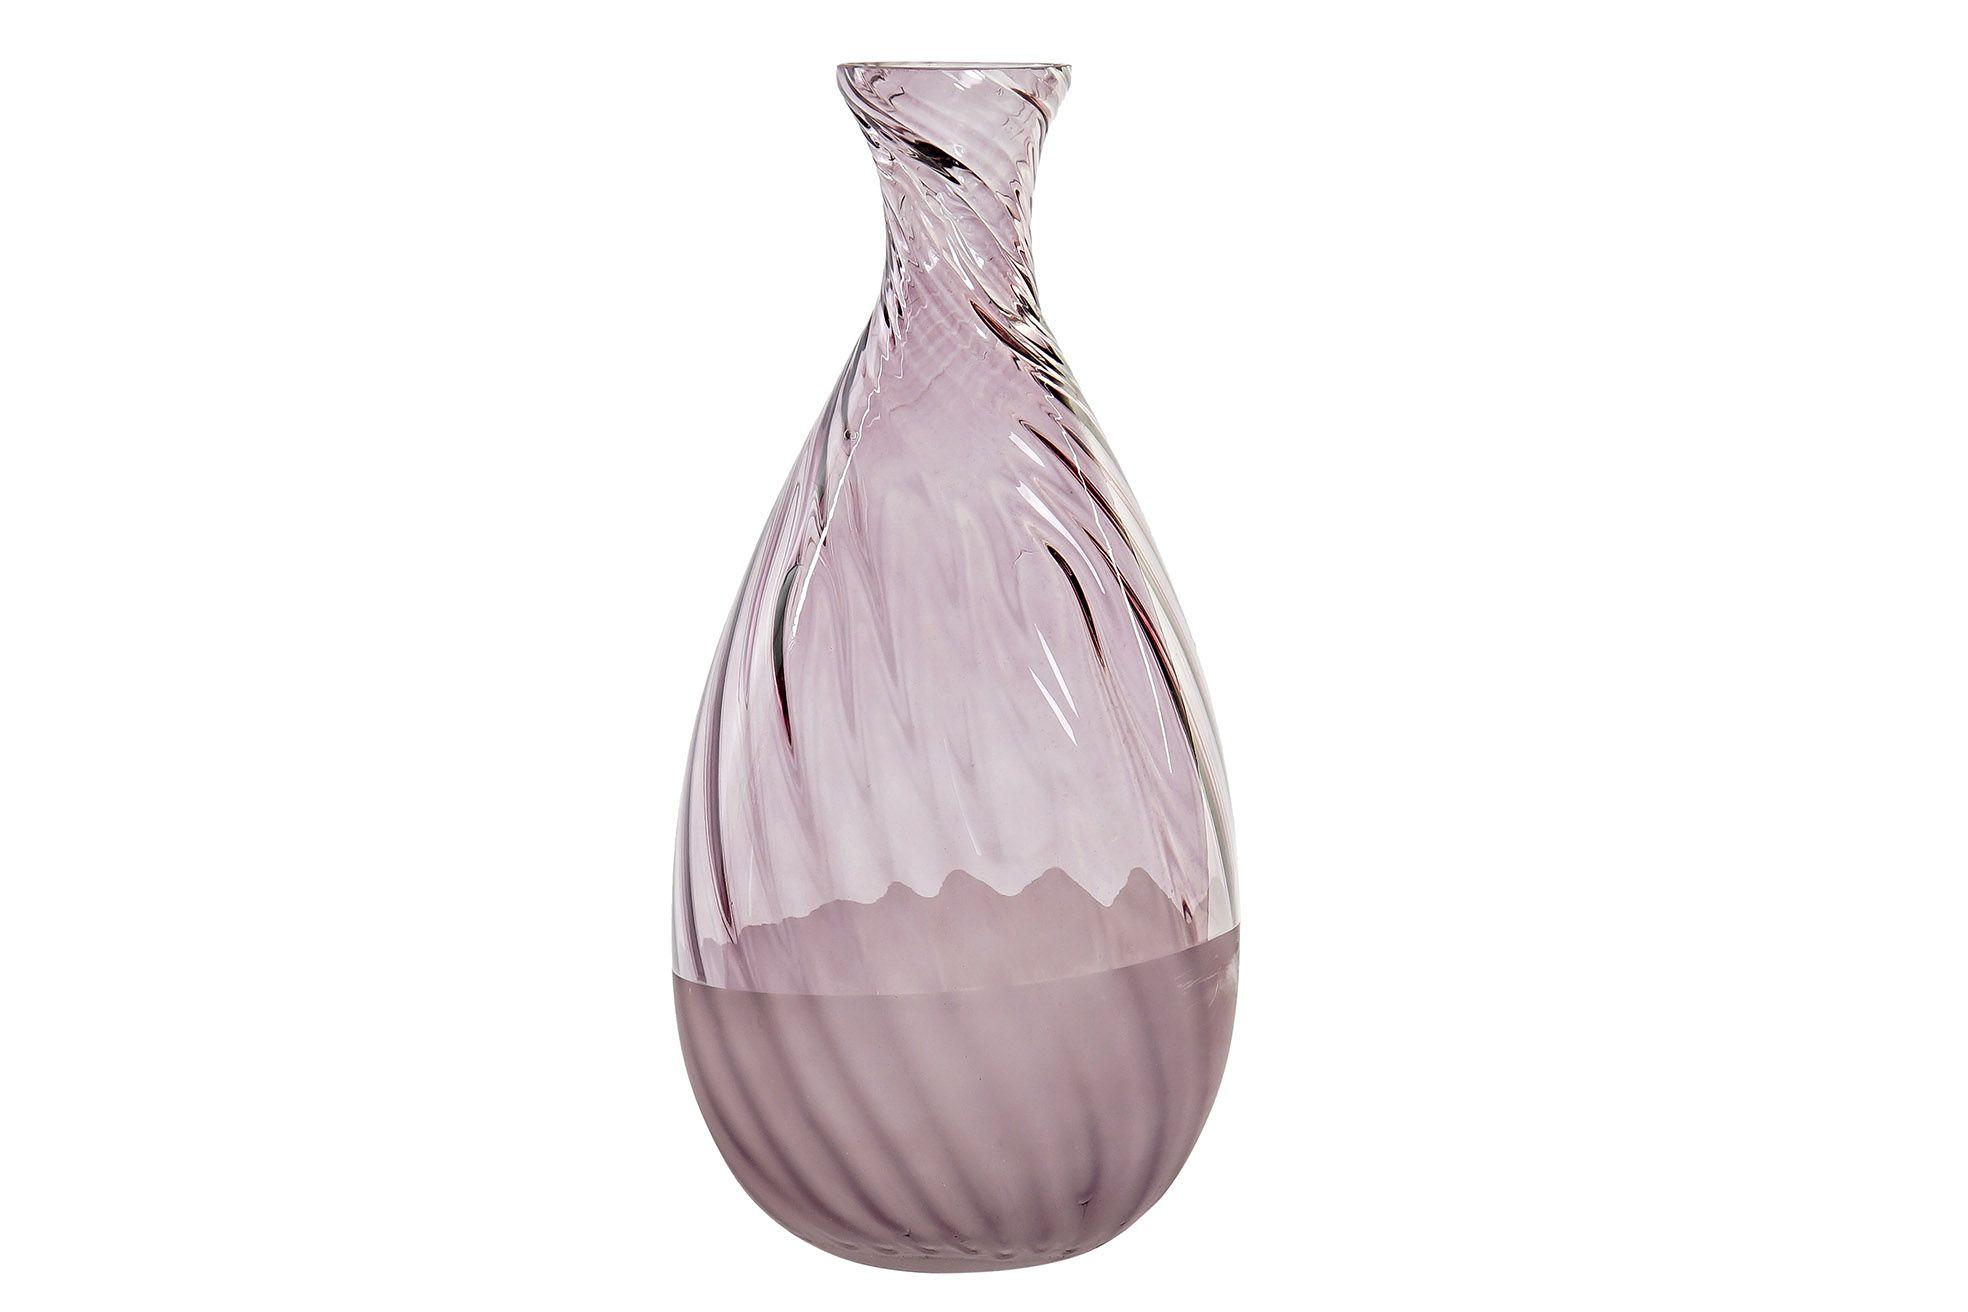 Vaso vetro rosa art JV-170786 diam17x34h €35